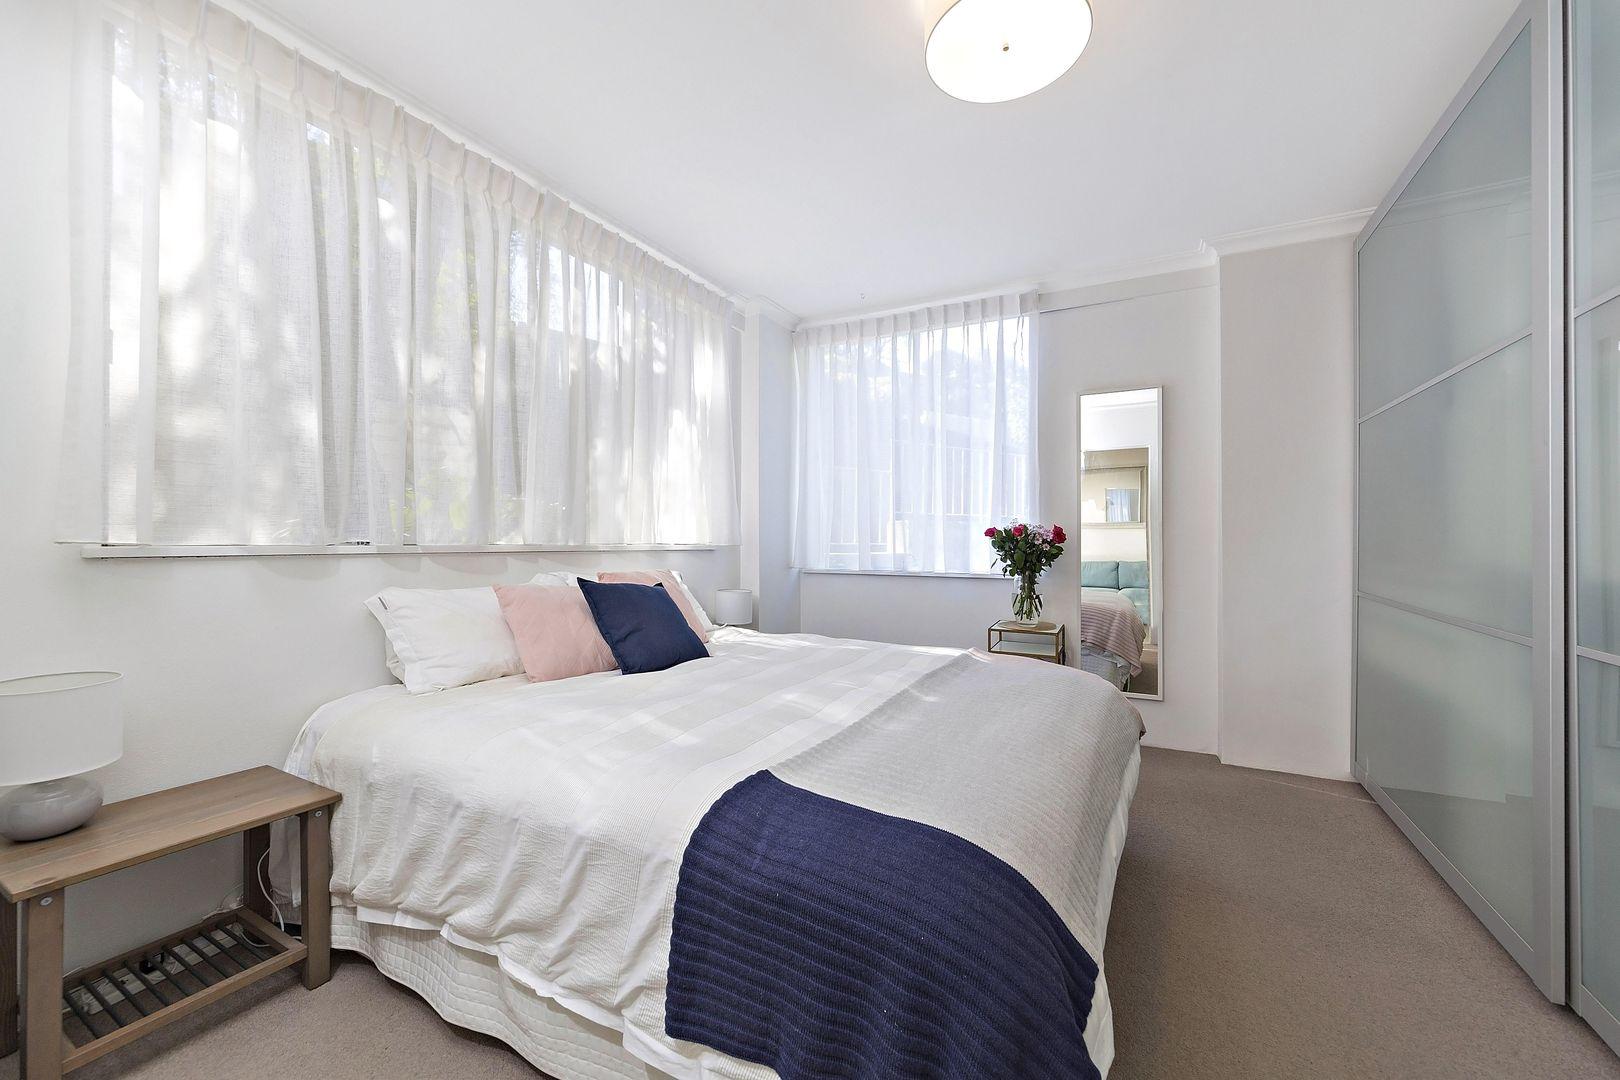 6/42 View Street, Chatswood NSW 2067, Image 2